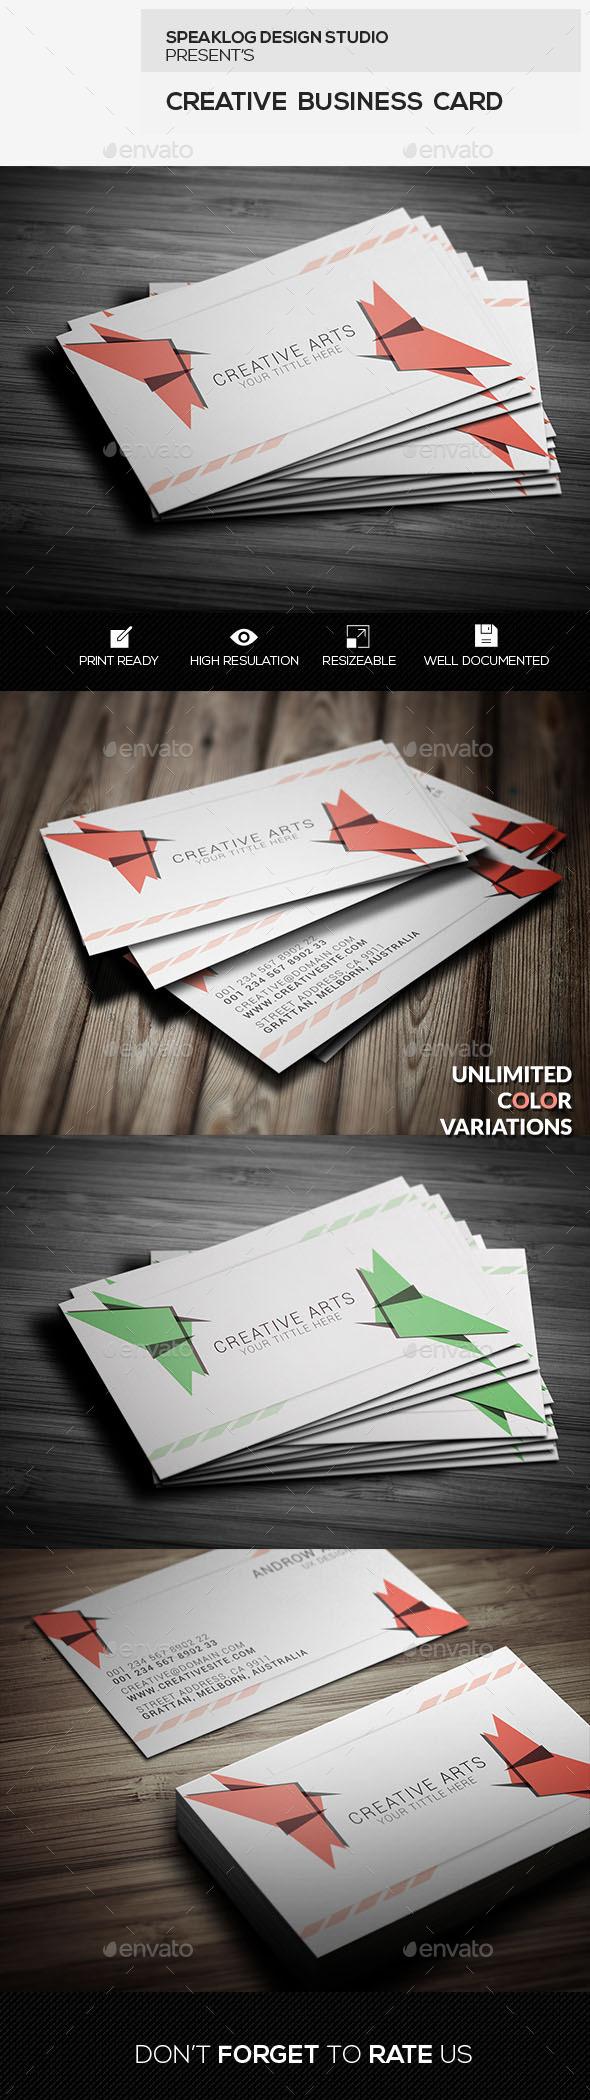 GraphicRiver Creative Business Card Design 11627268